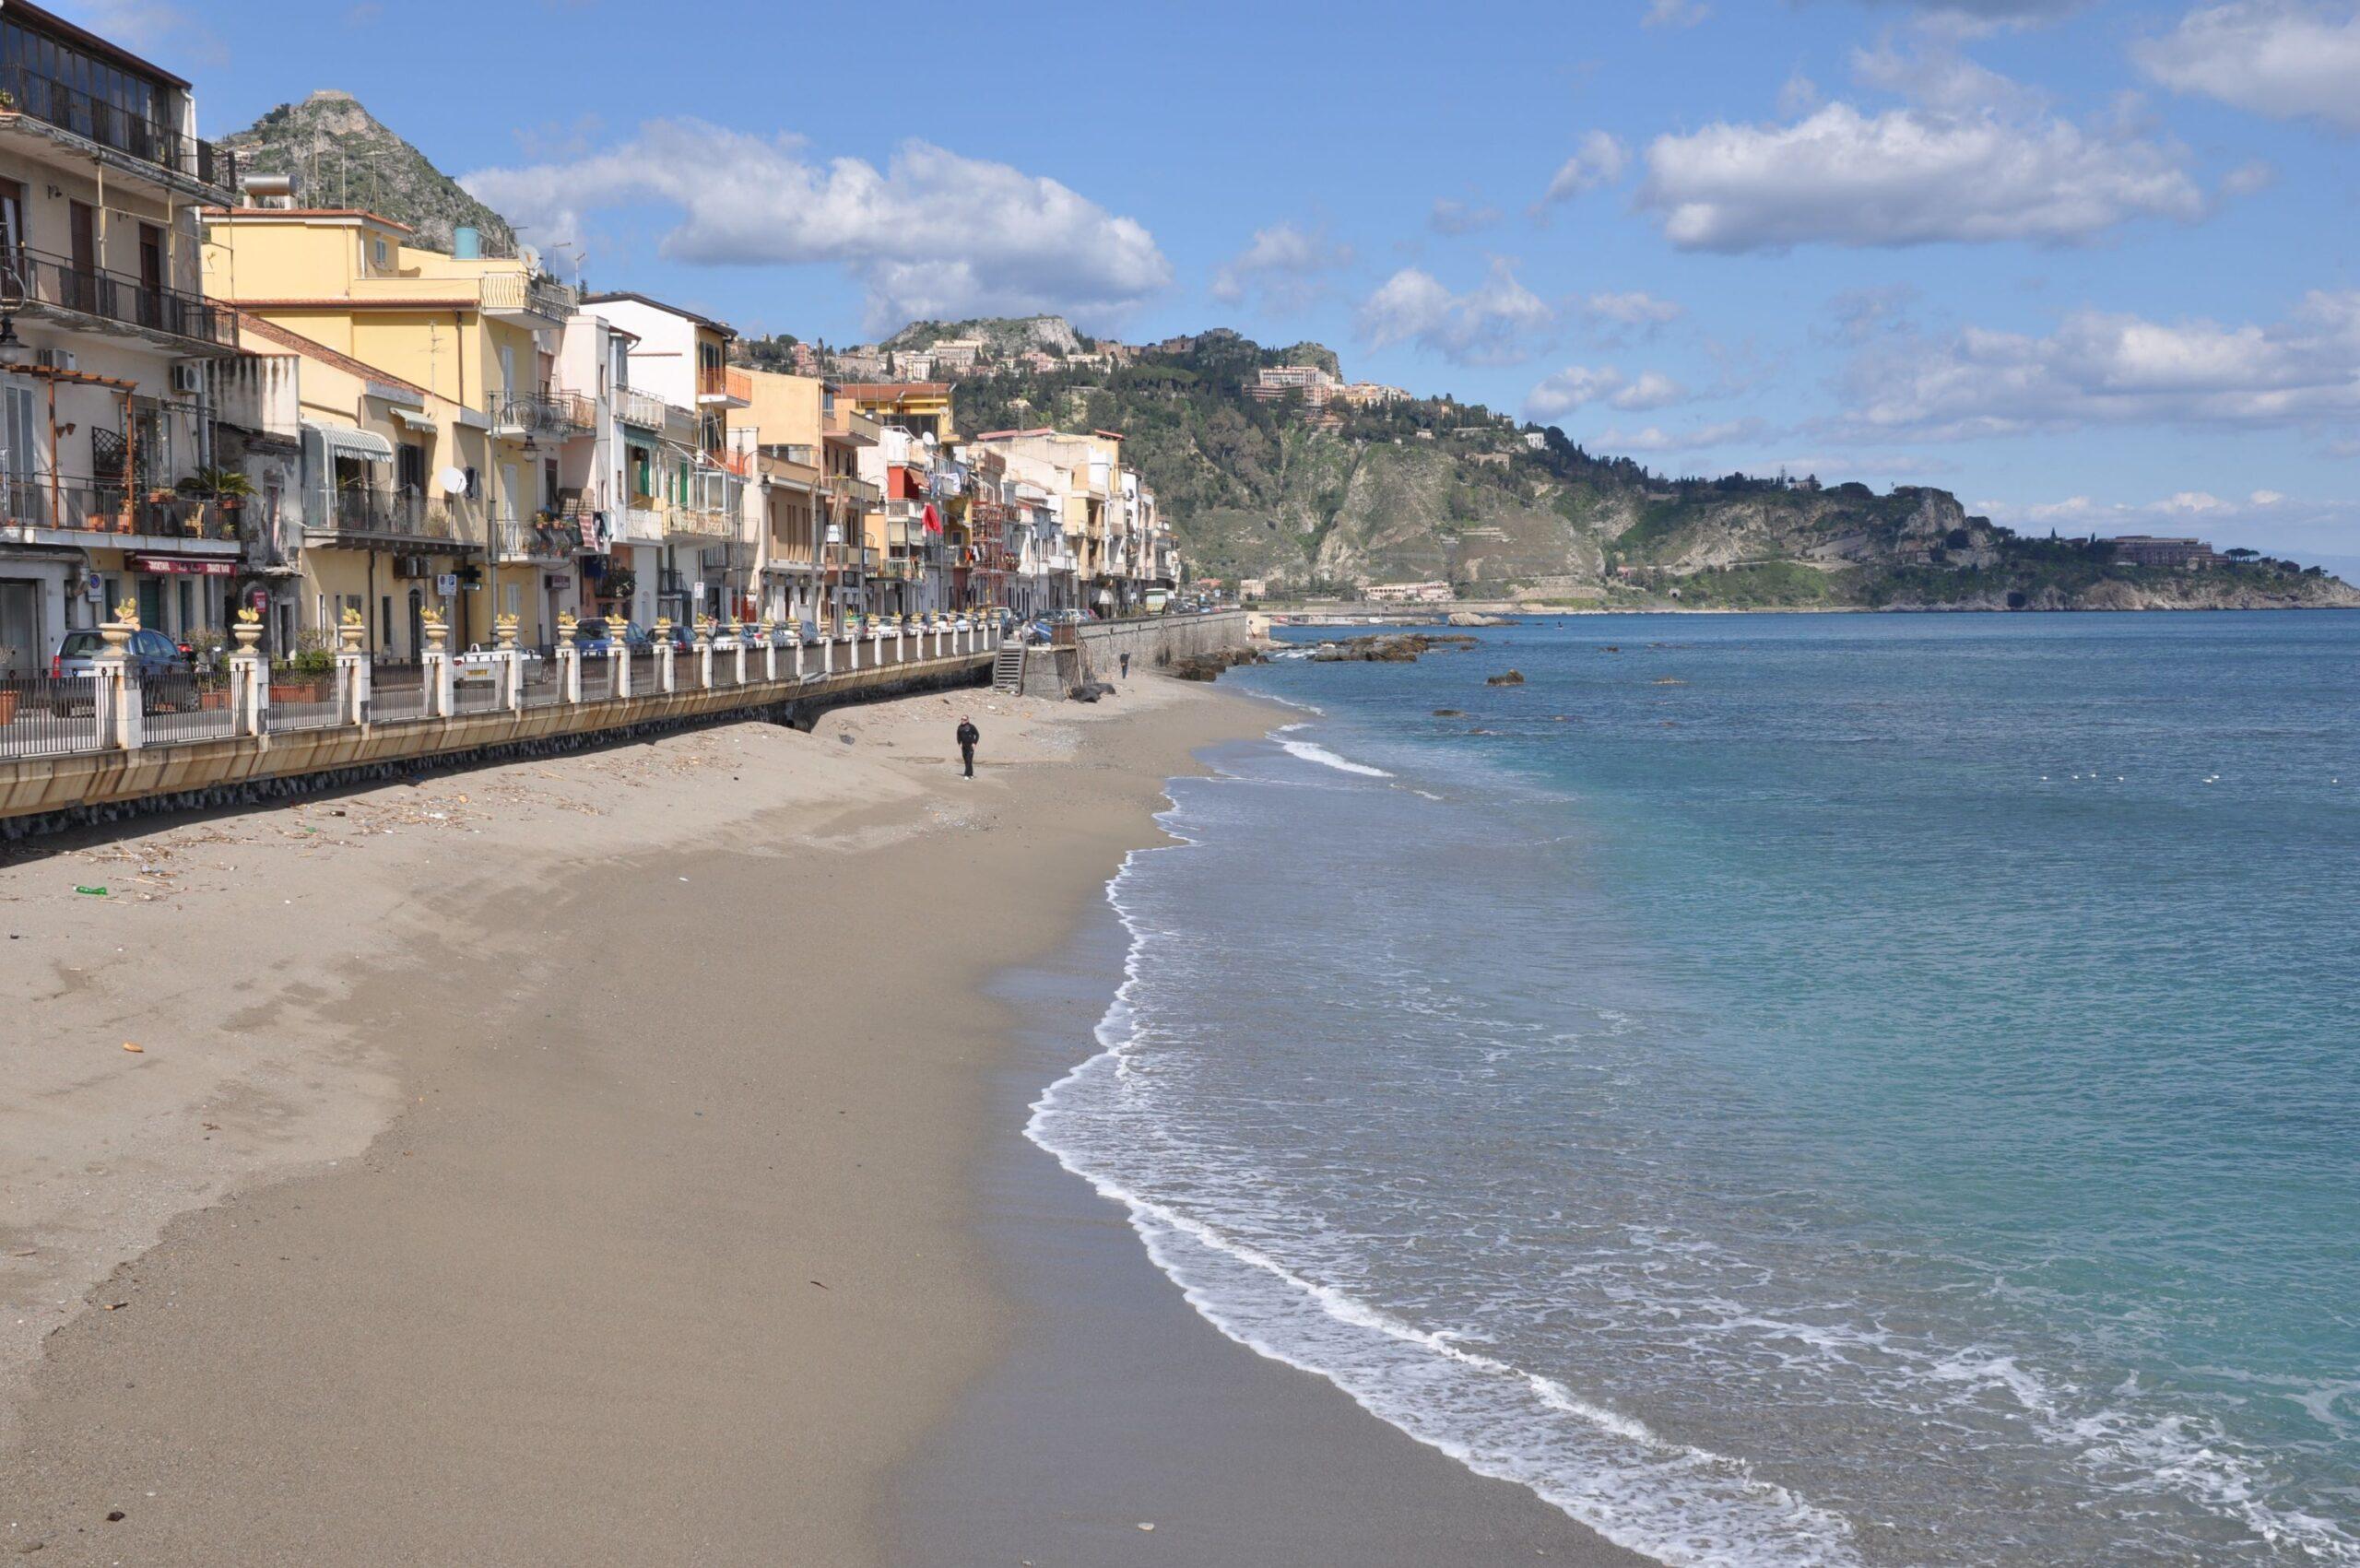 Plaża Giardini Naxos, Sicily, licencja: shutterstock/By AMB